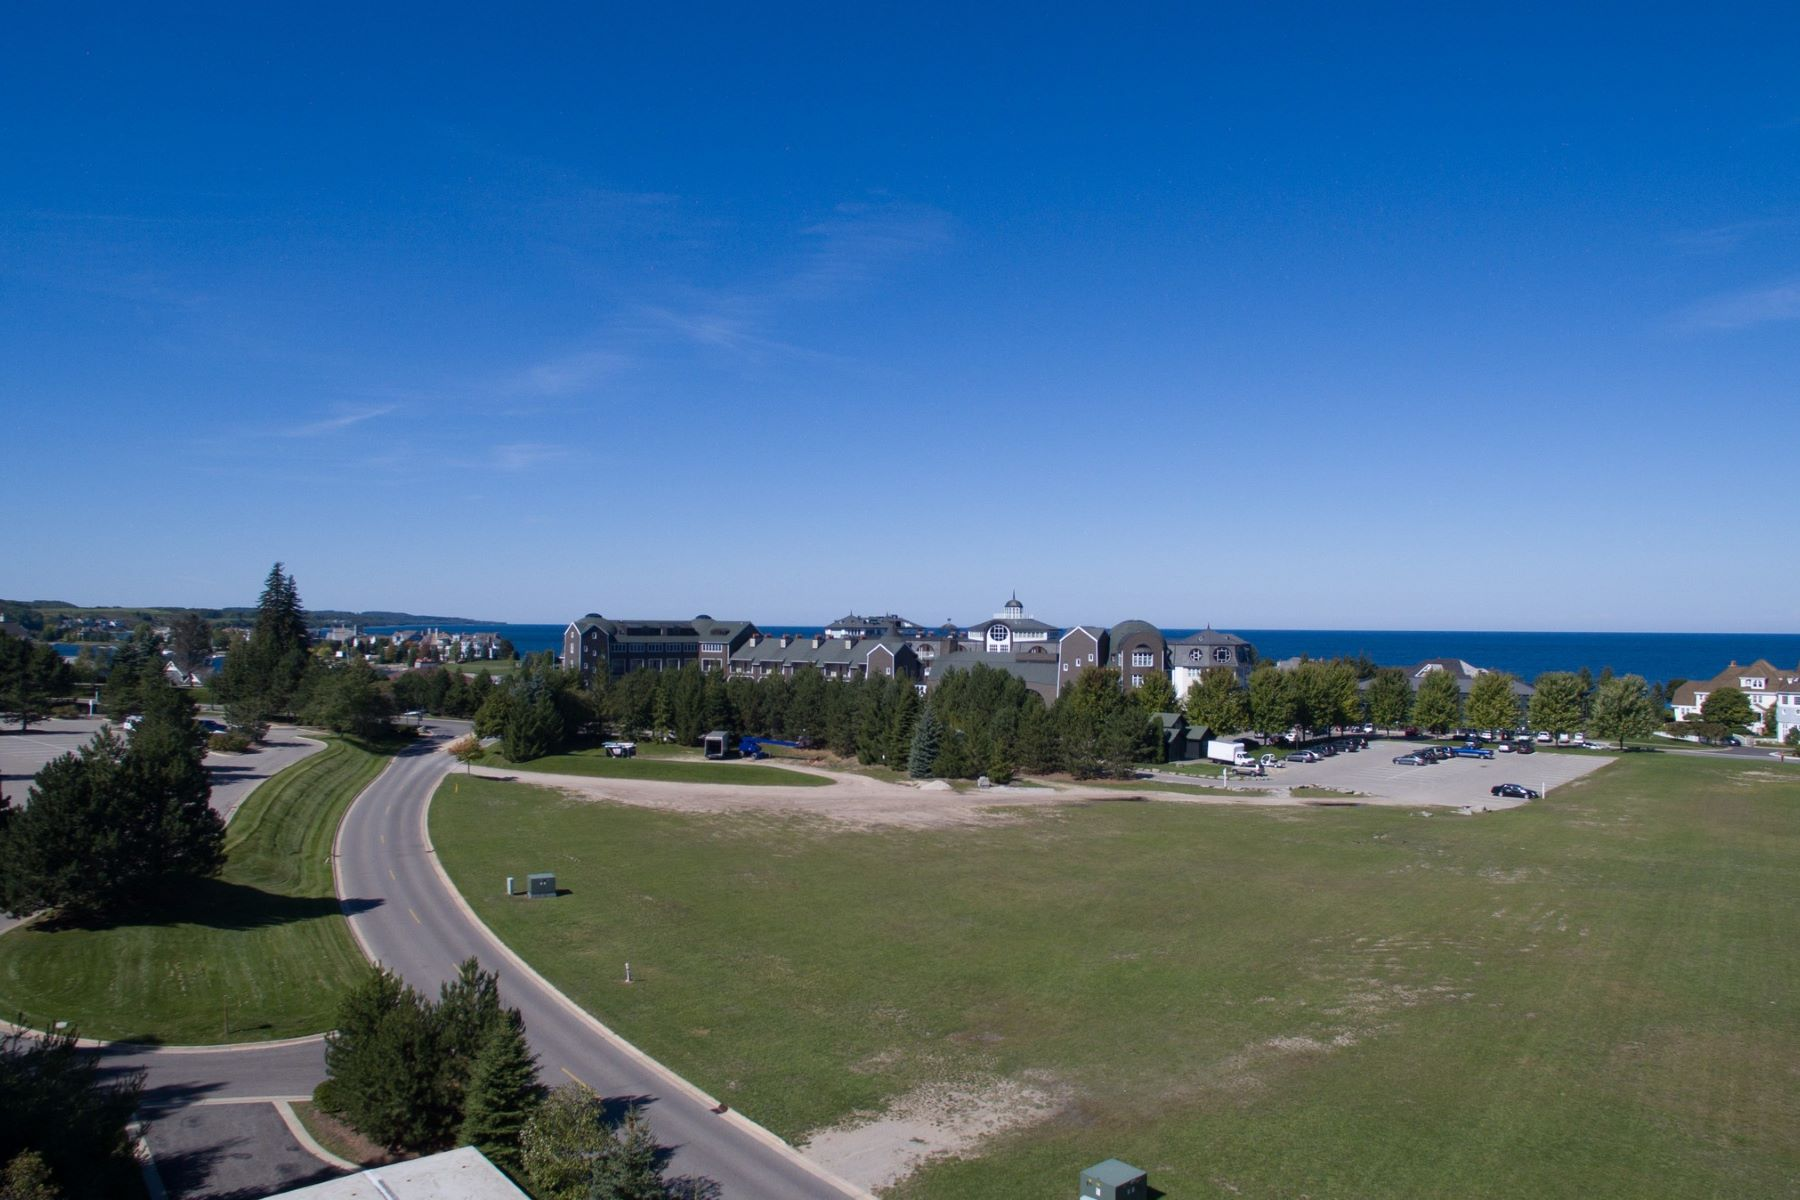 Additional photo for property listing at Unit 9, The Ridge TBD Cliffs Drive, Unit 9, The Ridge Bay Harbor, Michigan 49770 United States